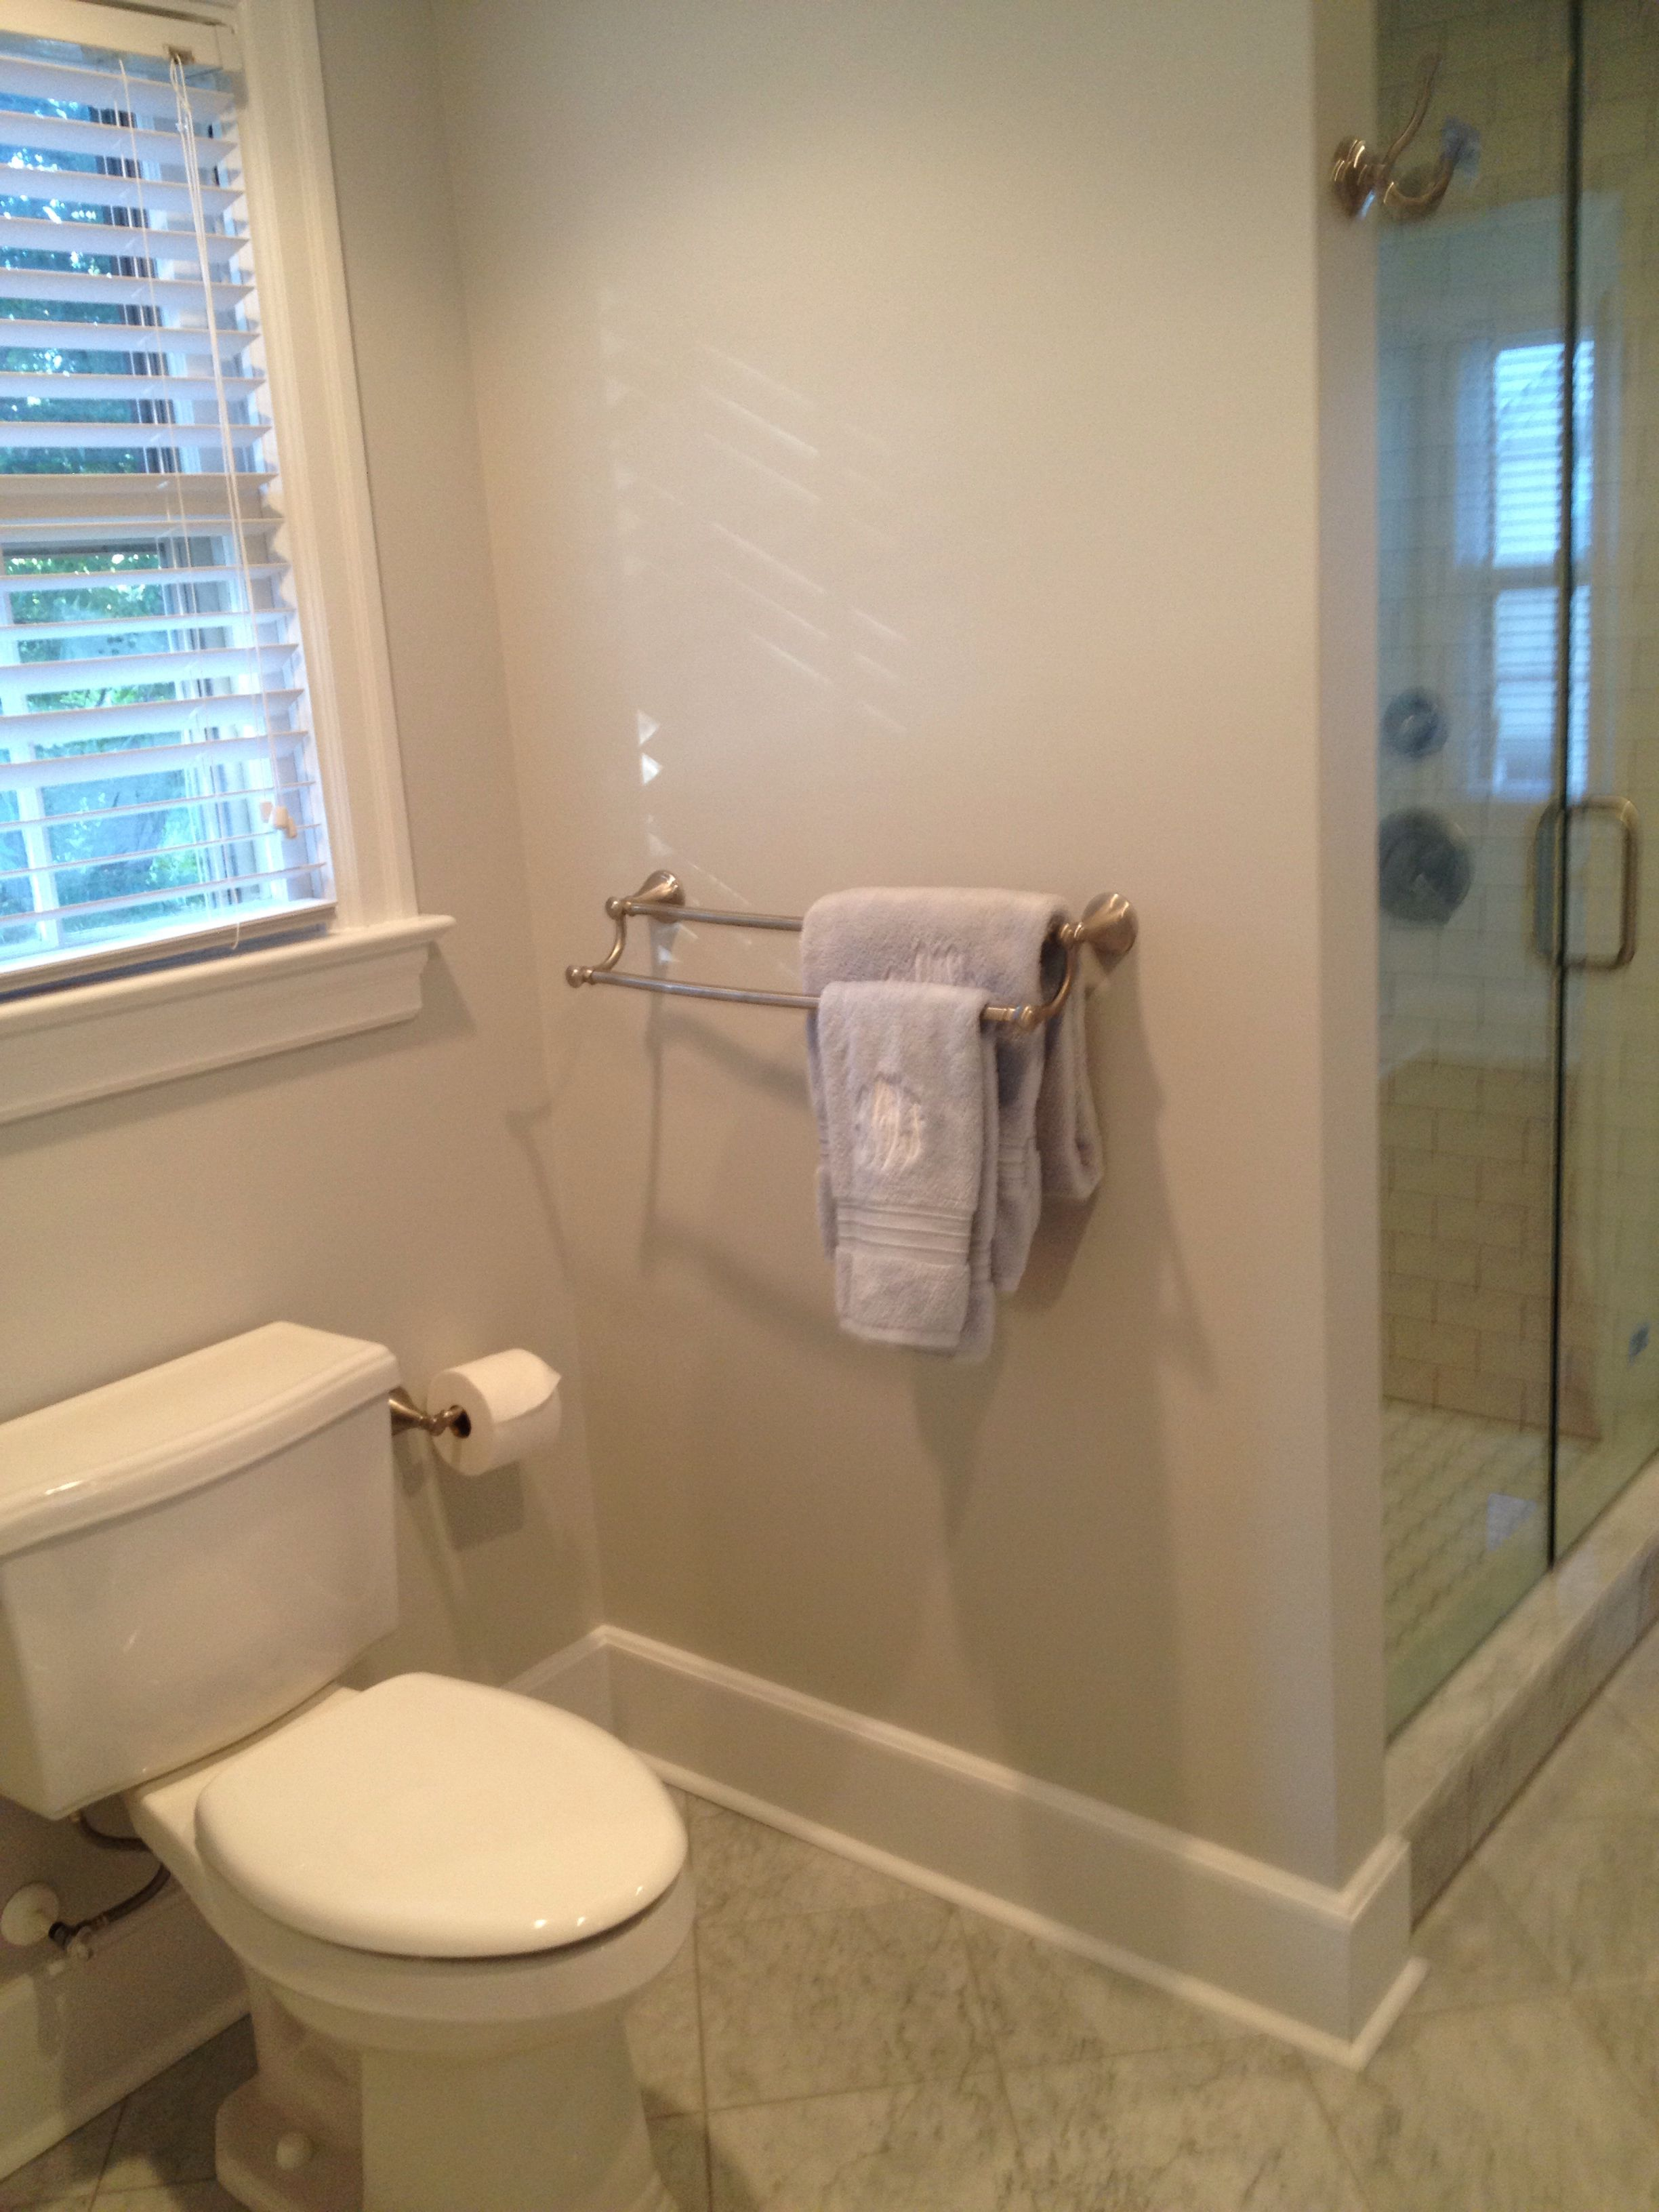 Window Over Toilet Design Ideas Pictures Remodel And Decor Bathroom Remodel Cost Small Half Bathrooms Half Bathroom